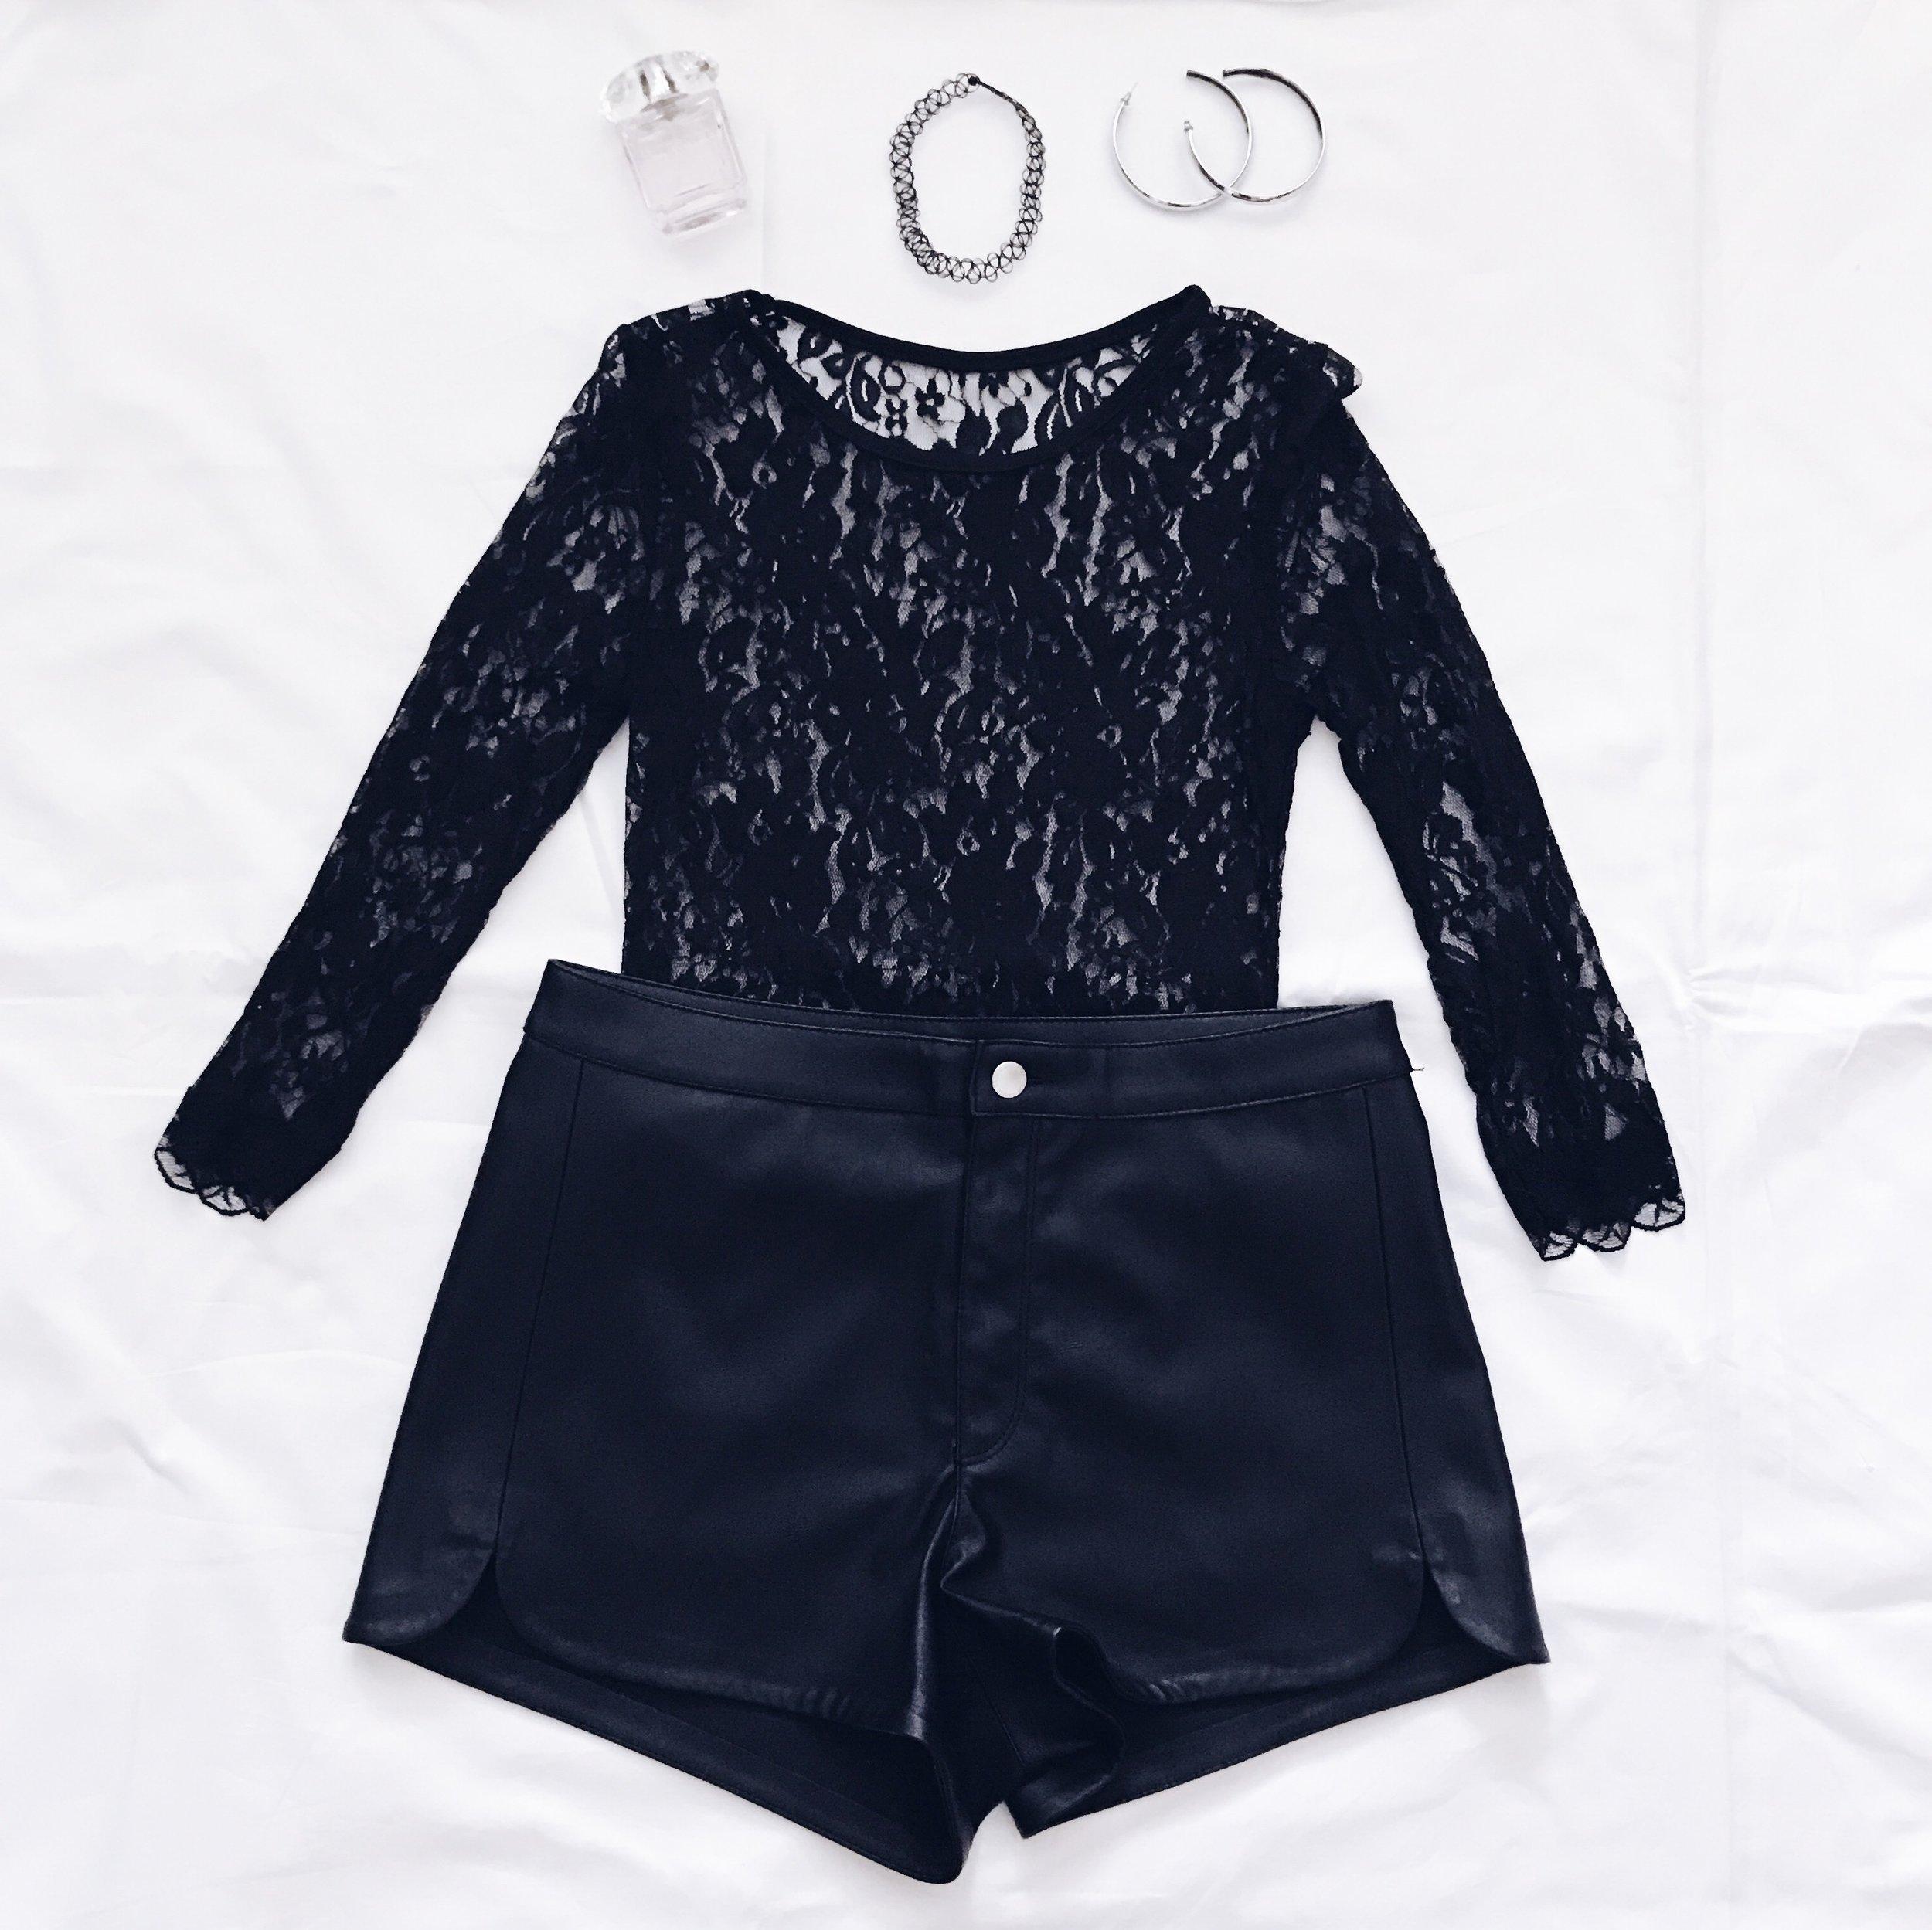 Leather Shorts: H&M    Black Lace Top: Tidebuy    Hoop Earrings: Nordstrom    Wire Choker: Dolls Kill     Perfume: Versace